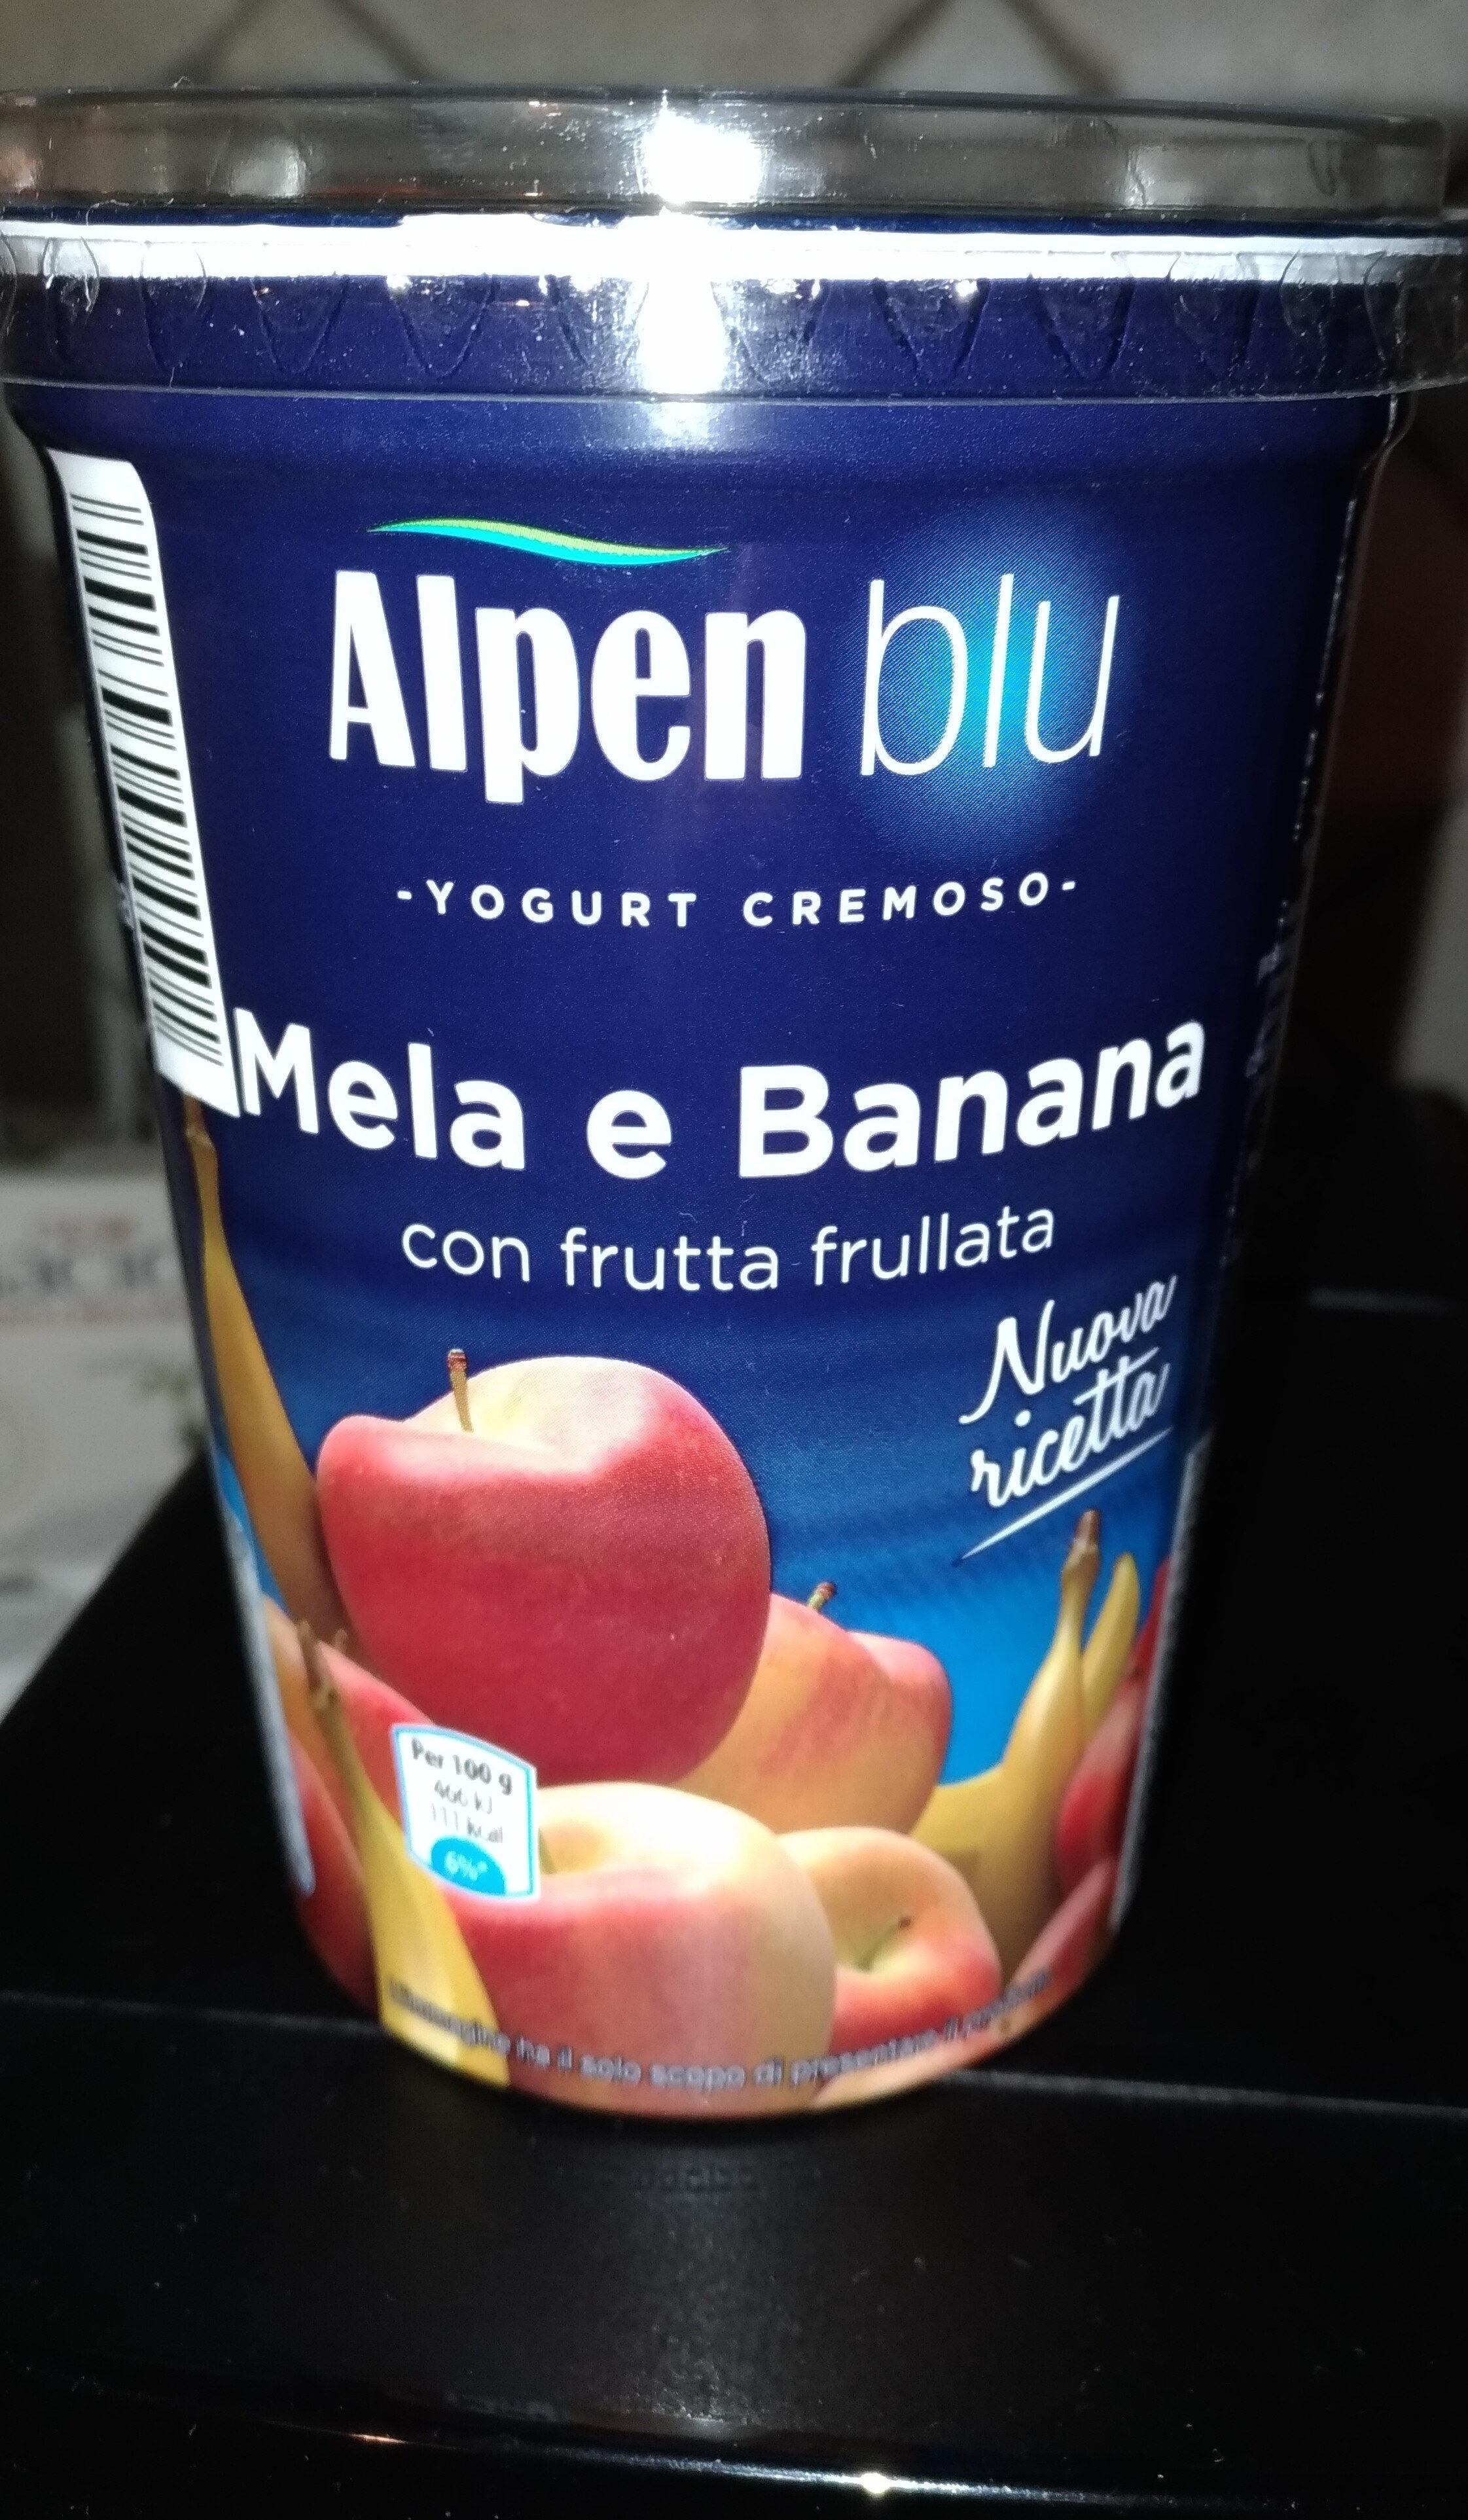 Alpen blu - Product